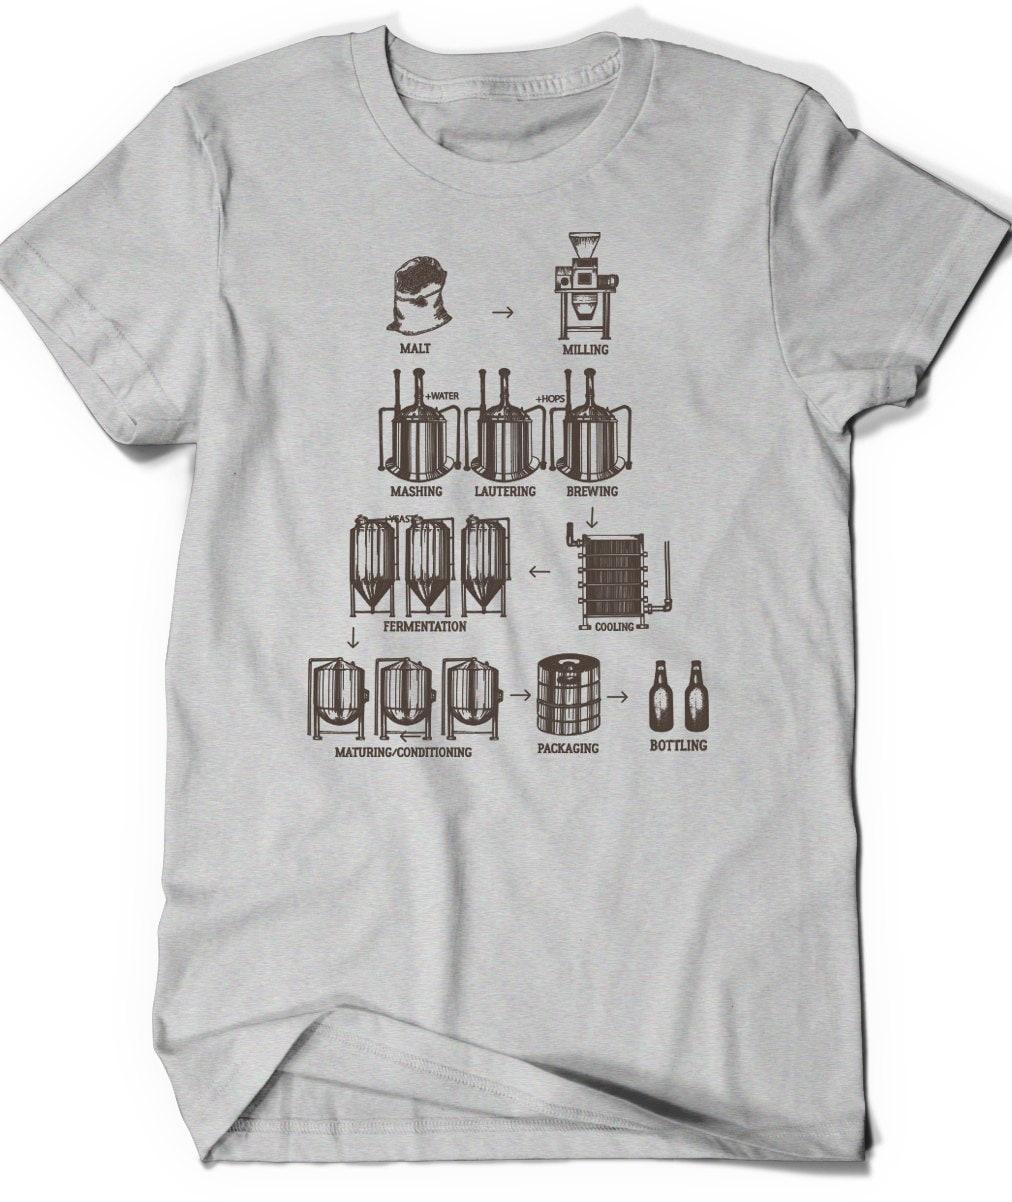 Homebrew Shirt T-Shirt T Shirt Tee Hops Craft Beer Homebrewing | Etsy